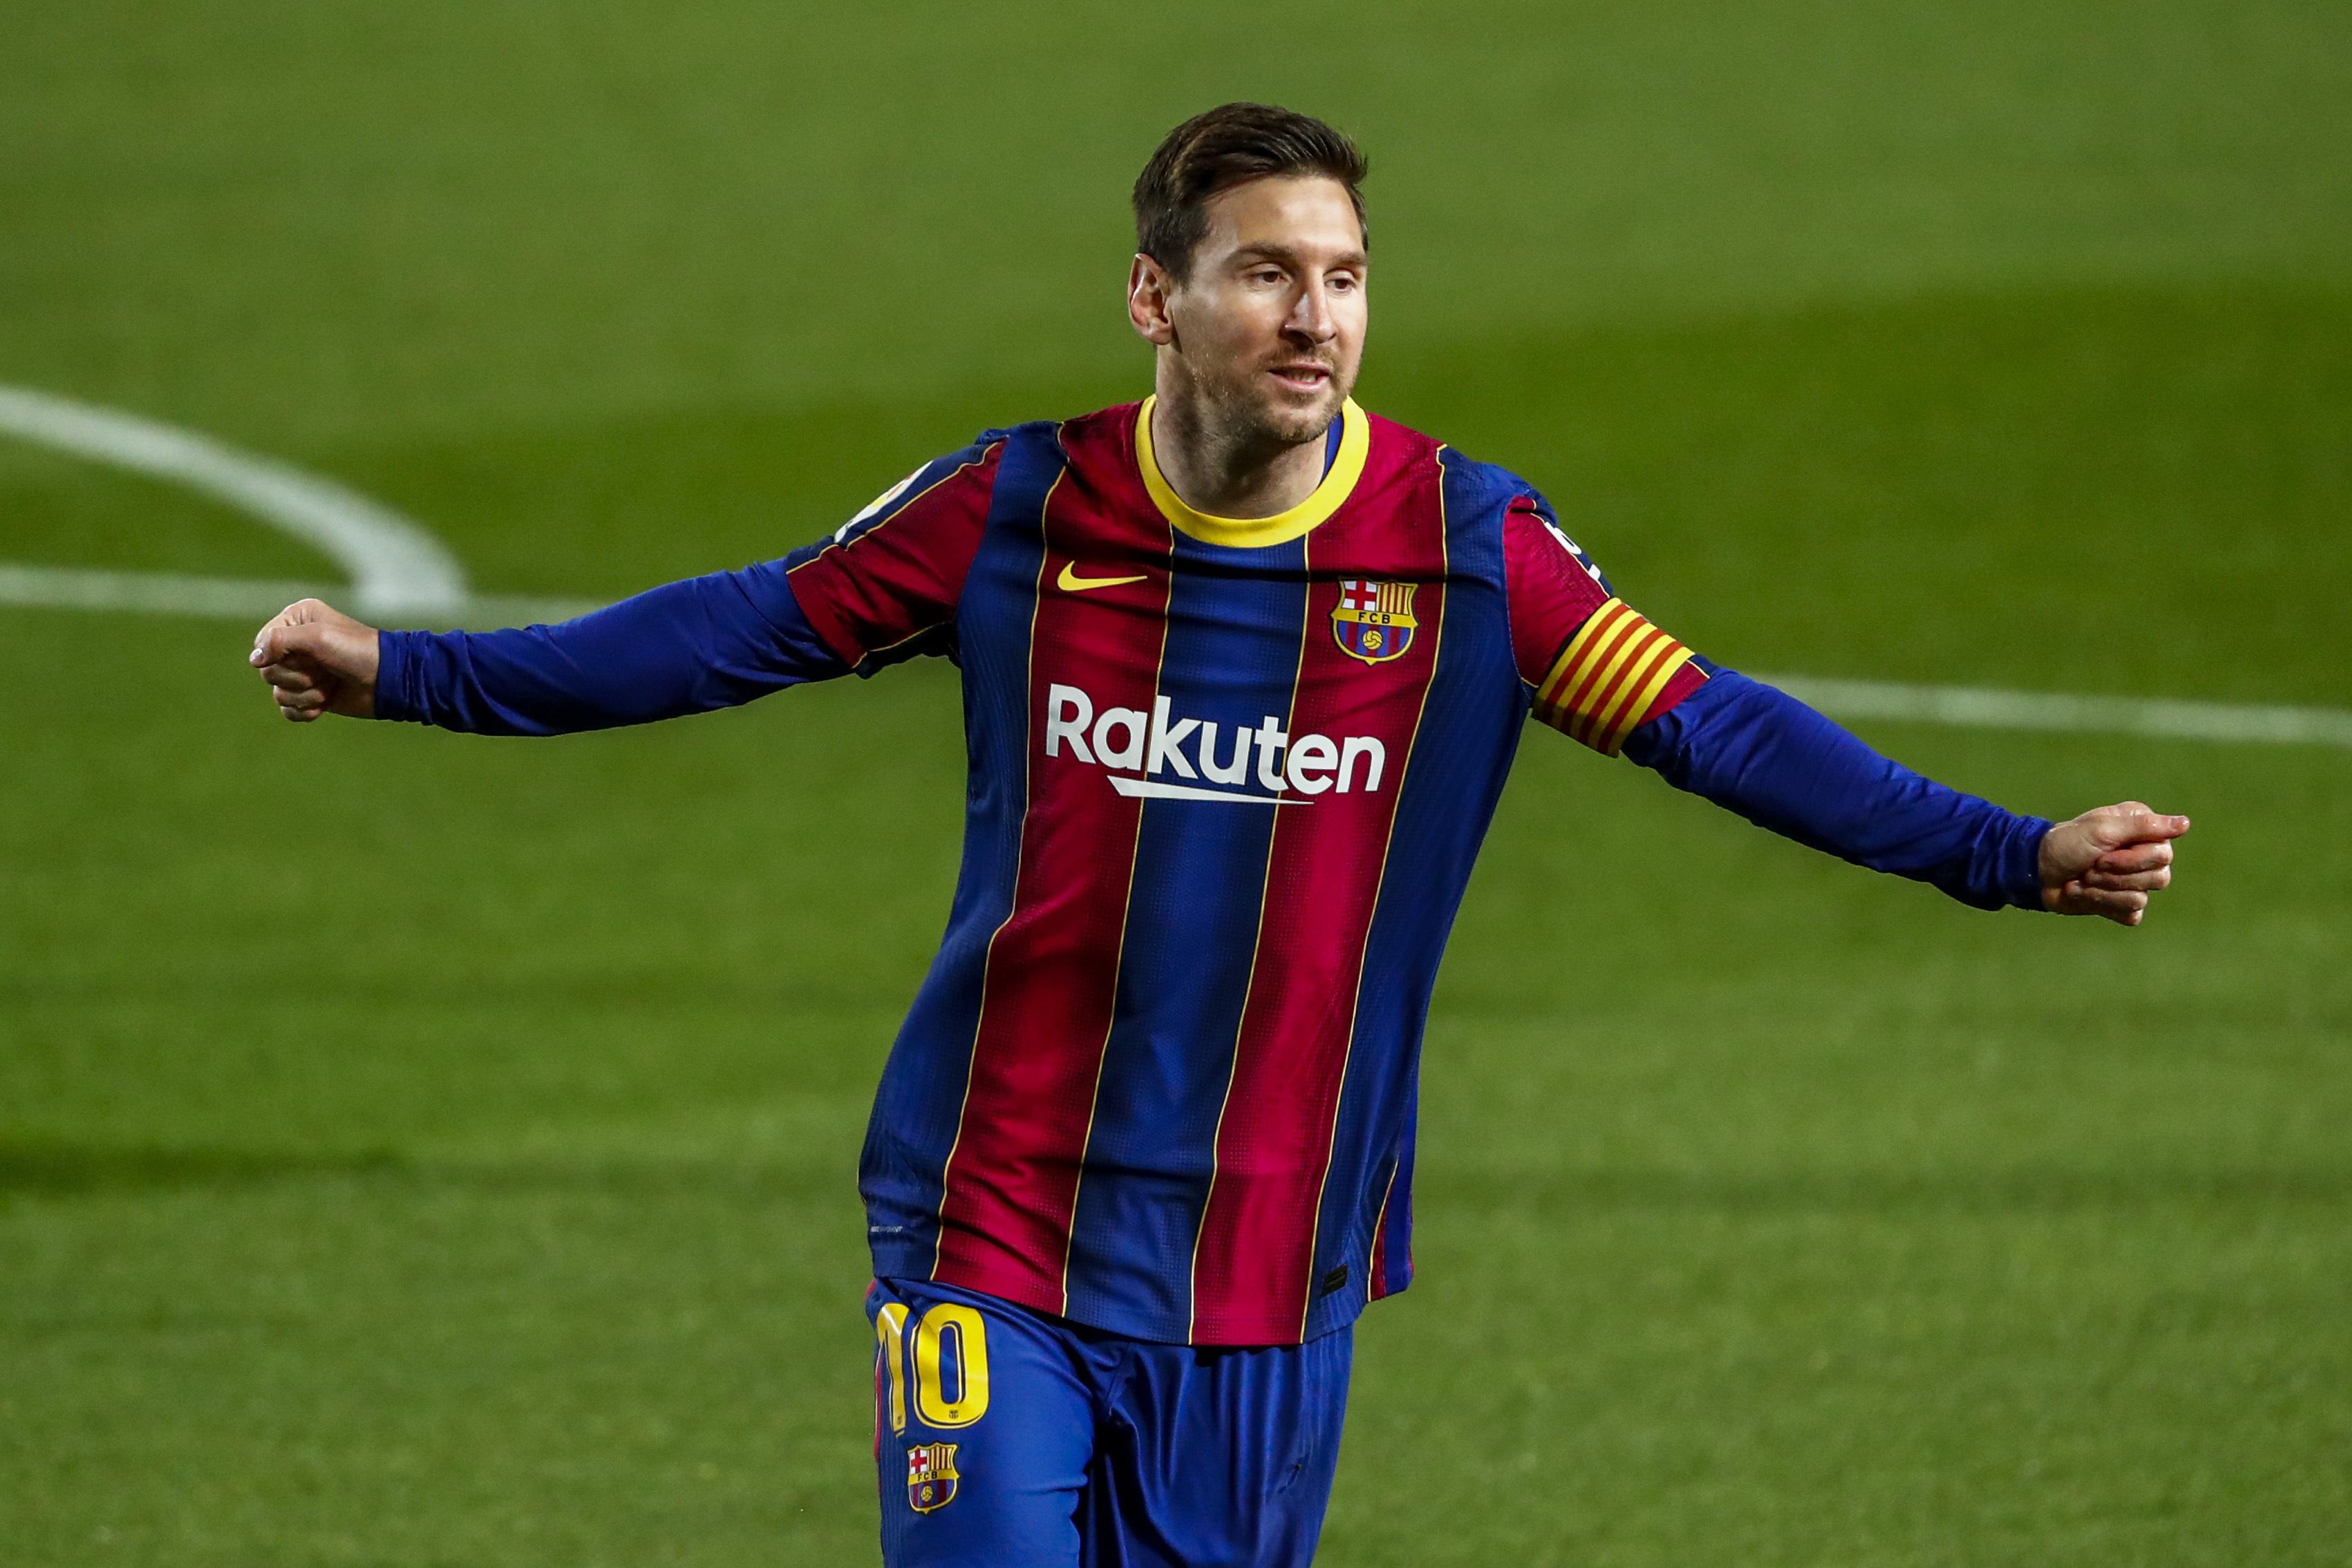 Lionel Messi Nearing PSG Contract Agreement as Mauricio Pochettino Confirms Talks